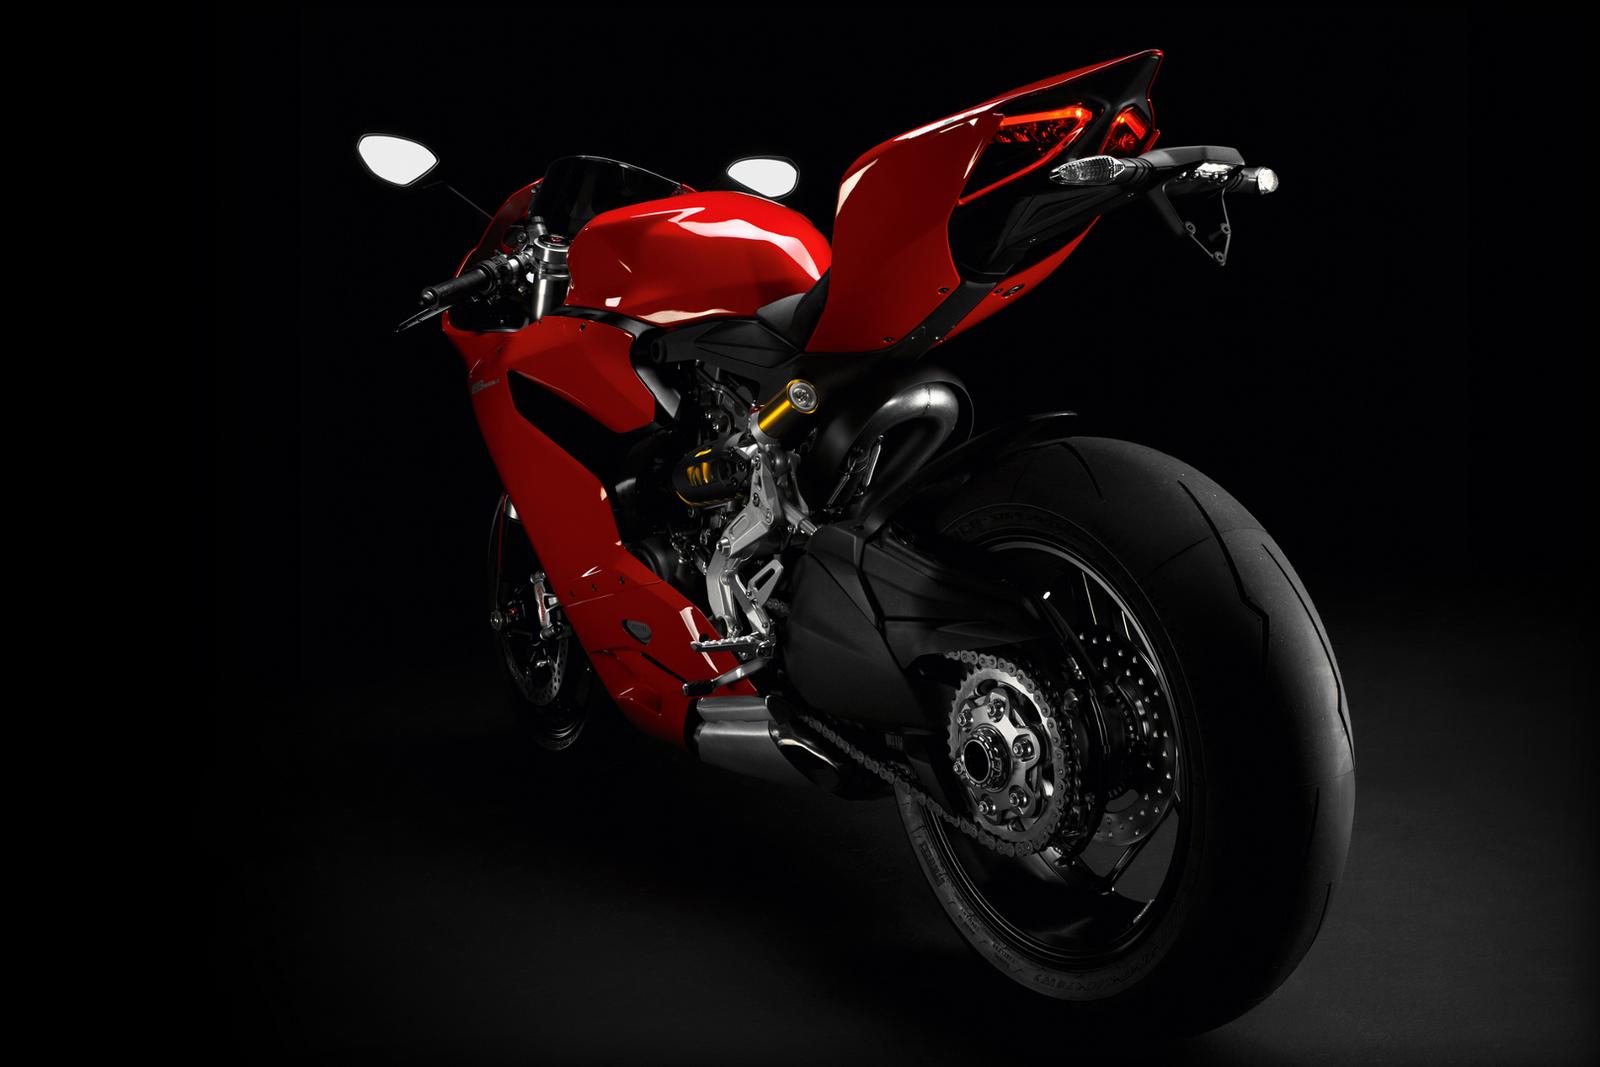 http://1.bp.blogspot.com/-D6acMrJEOfk/T2qxJAR4_YI/AAAAAAAACBU/UMkfflWe0m0/s1600/Ducati-SBK-1199-Panigale.png